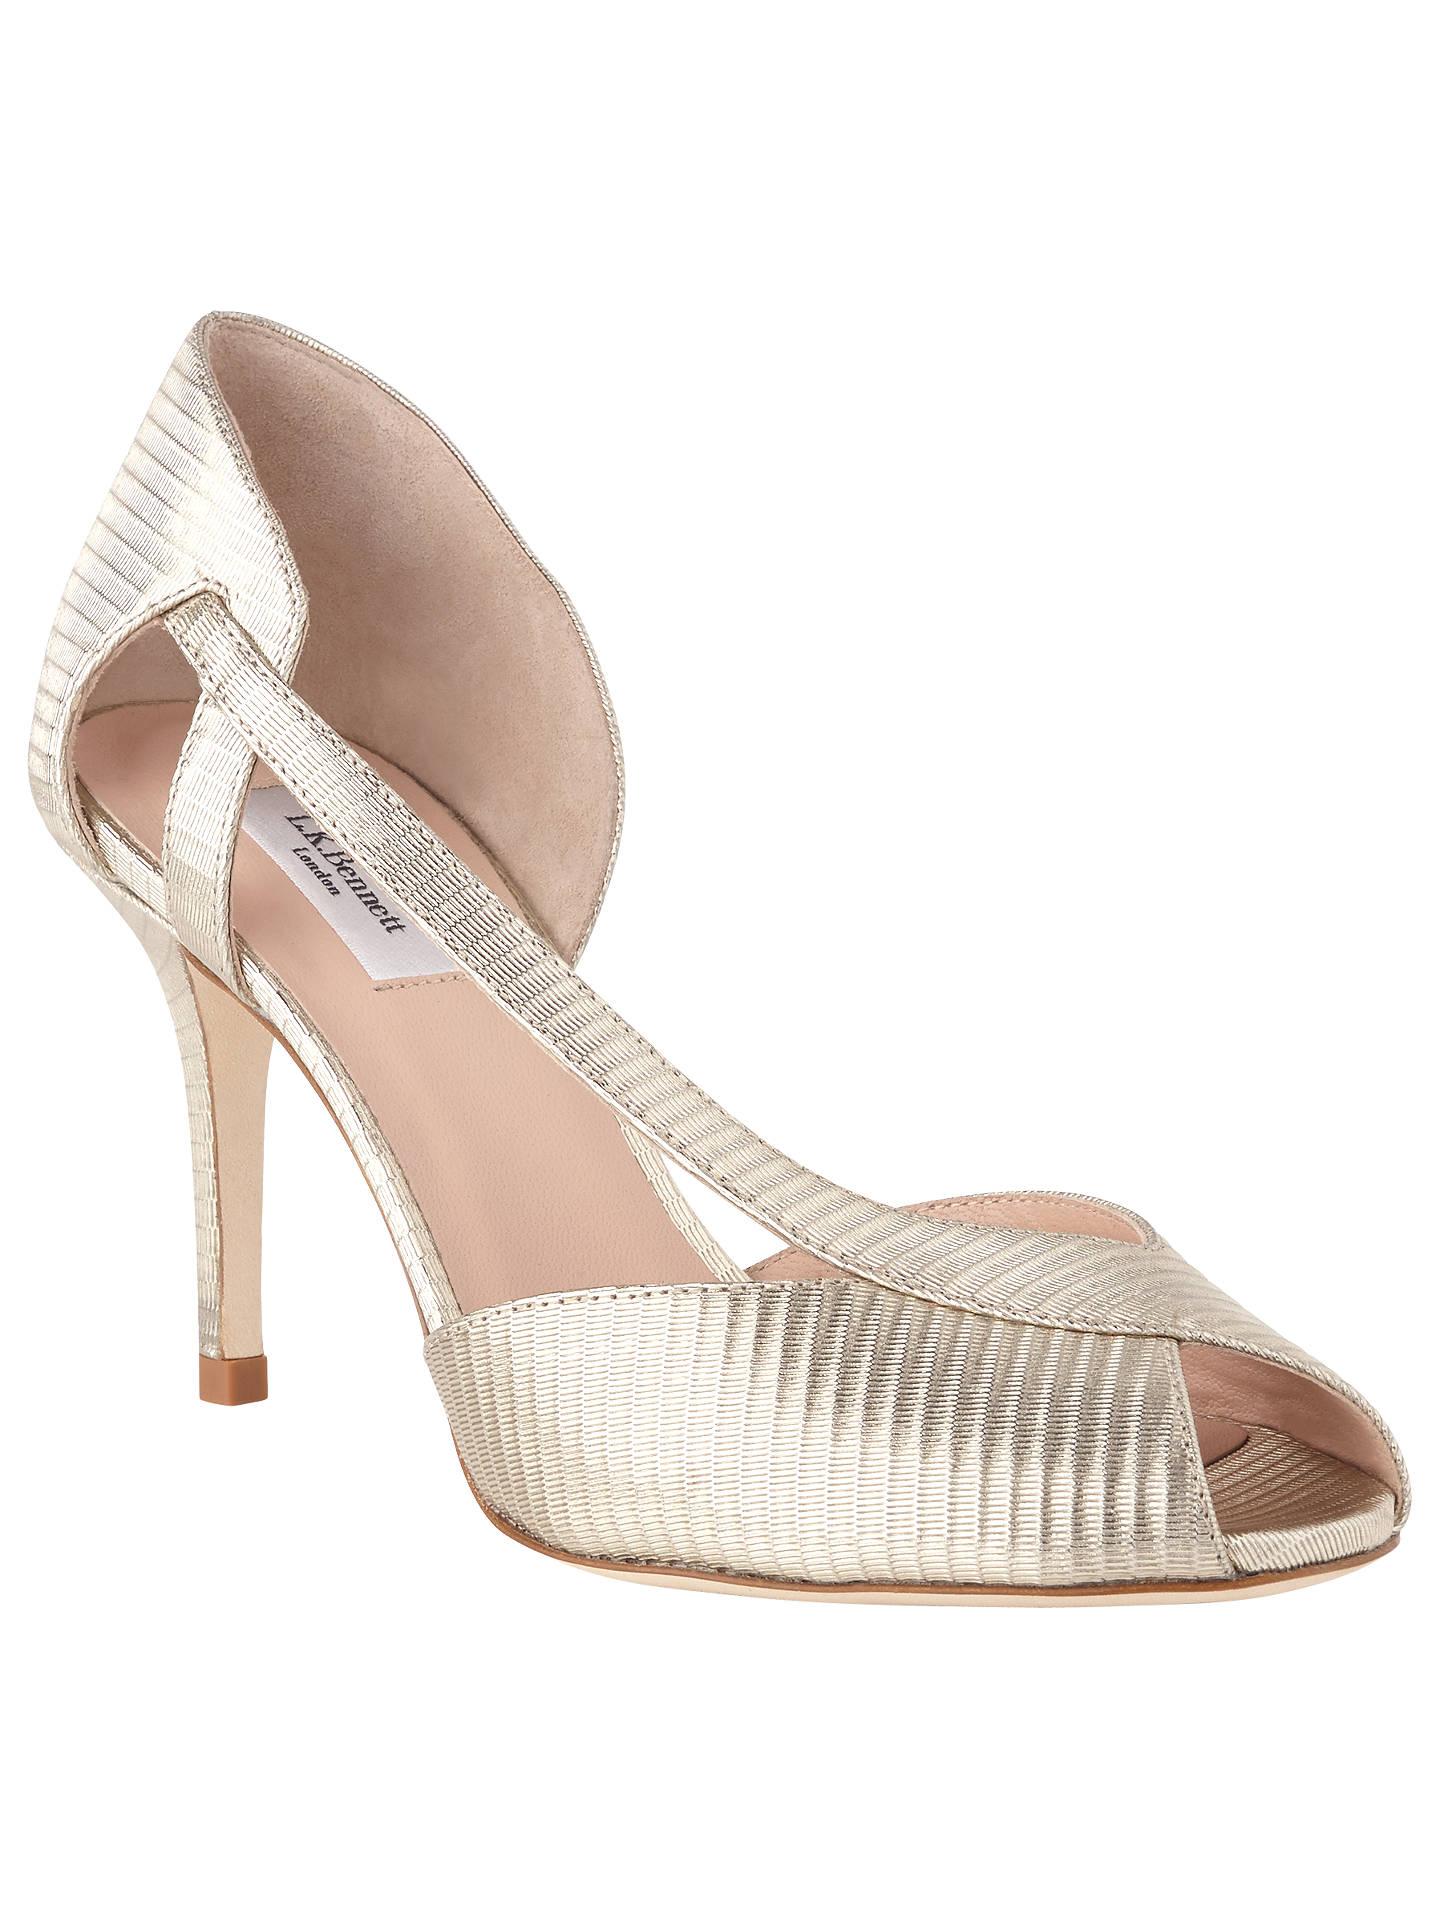 c8b8b7a1c1eebe Buy L.K.Bennett Liya Peep Toe Sandals